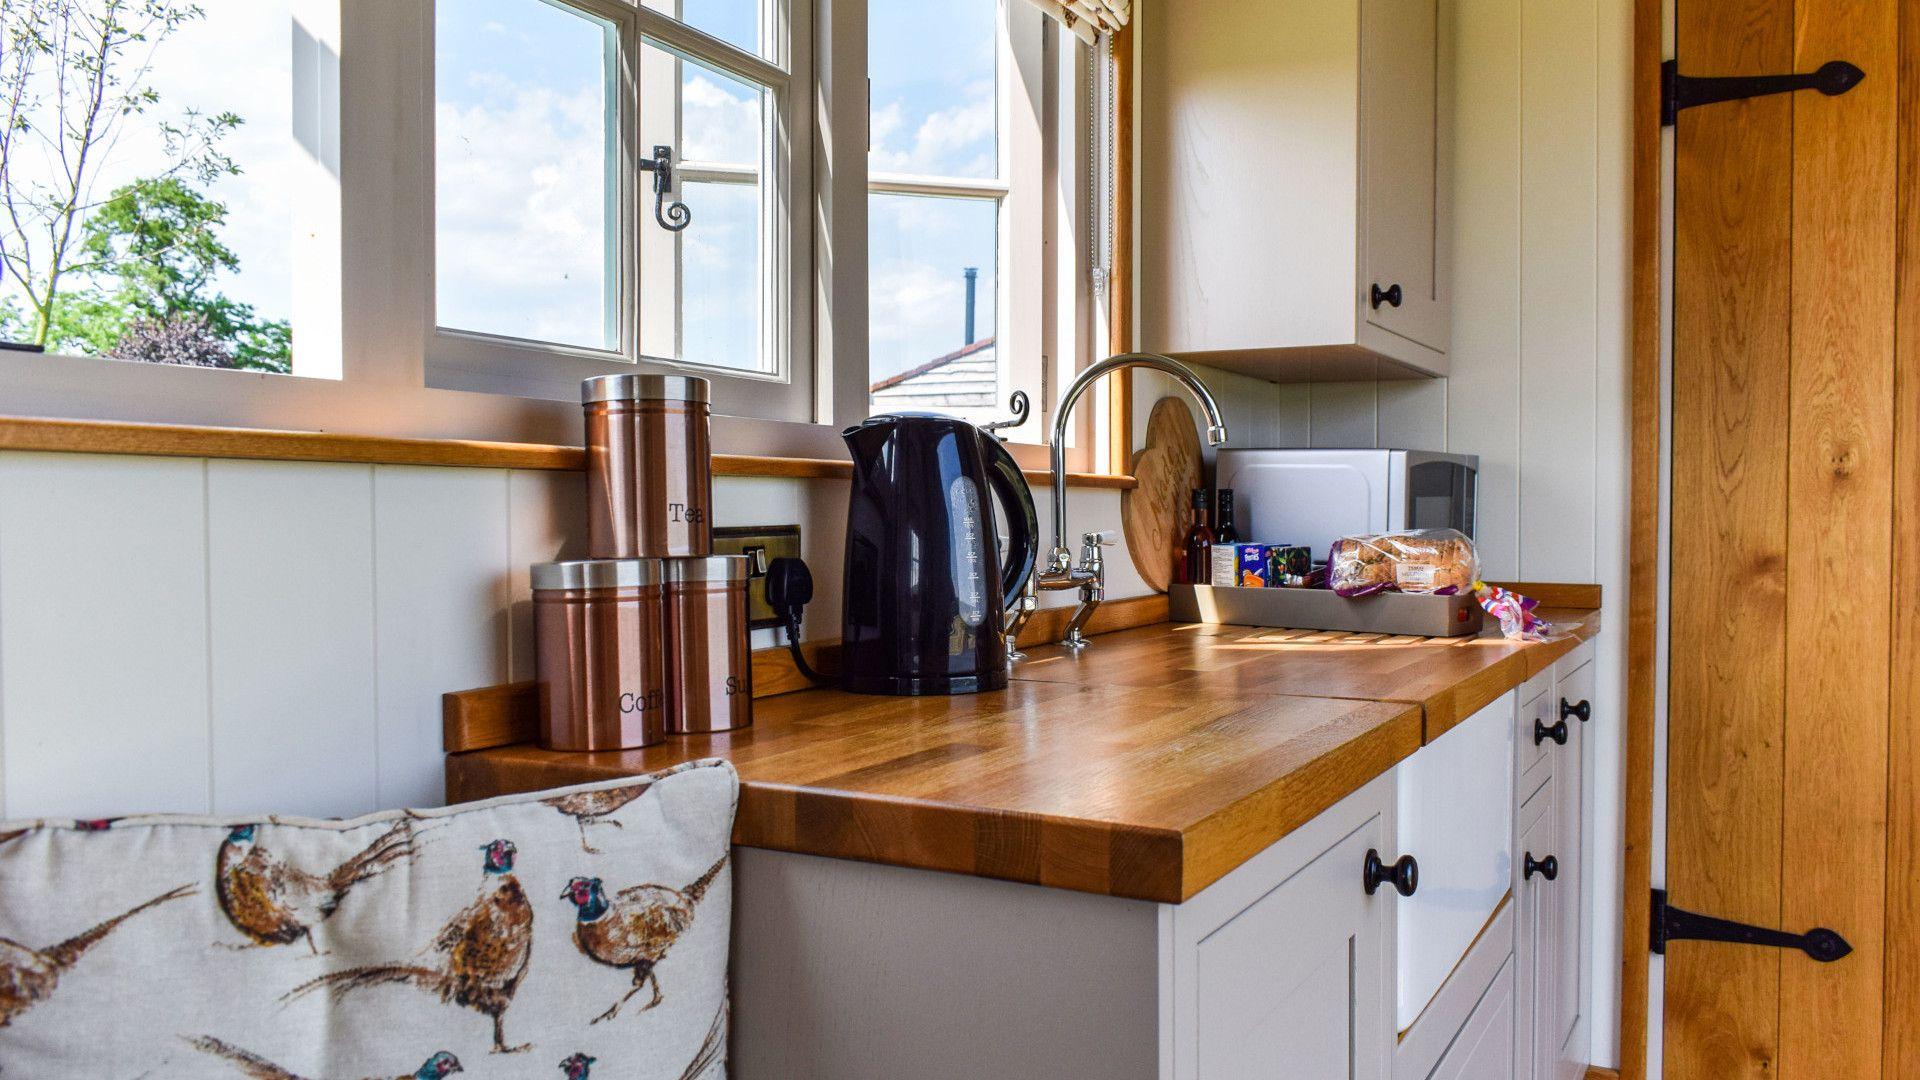 Kitchenette, Shepherds Hut at Avon Farm, Bolthole Retreats